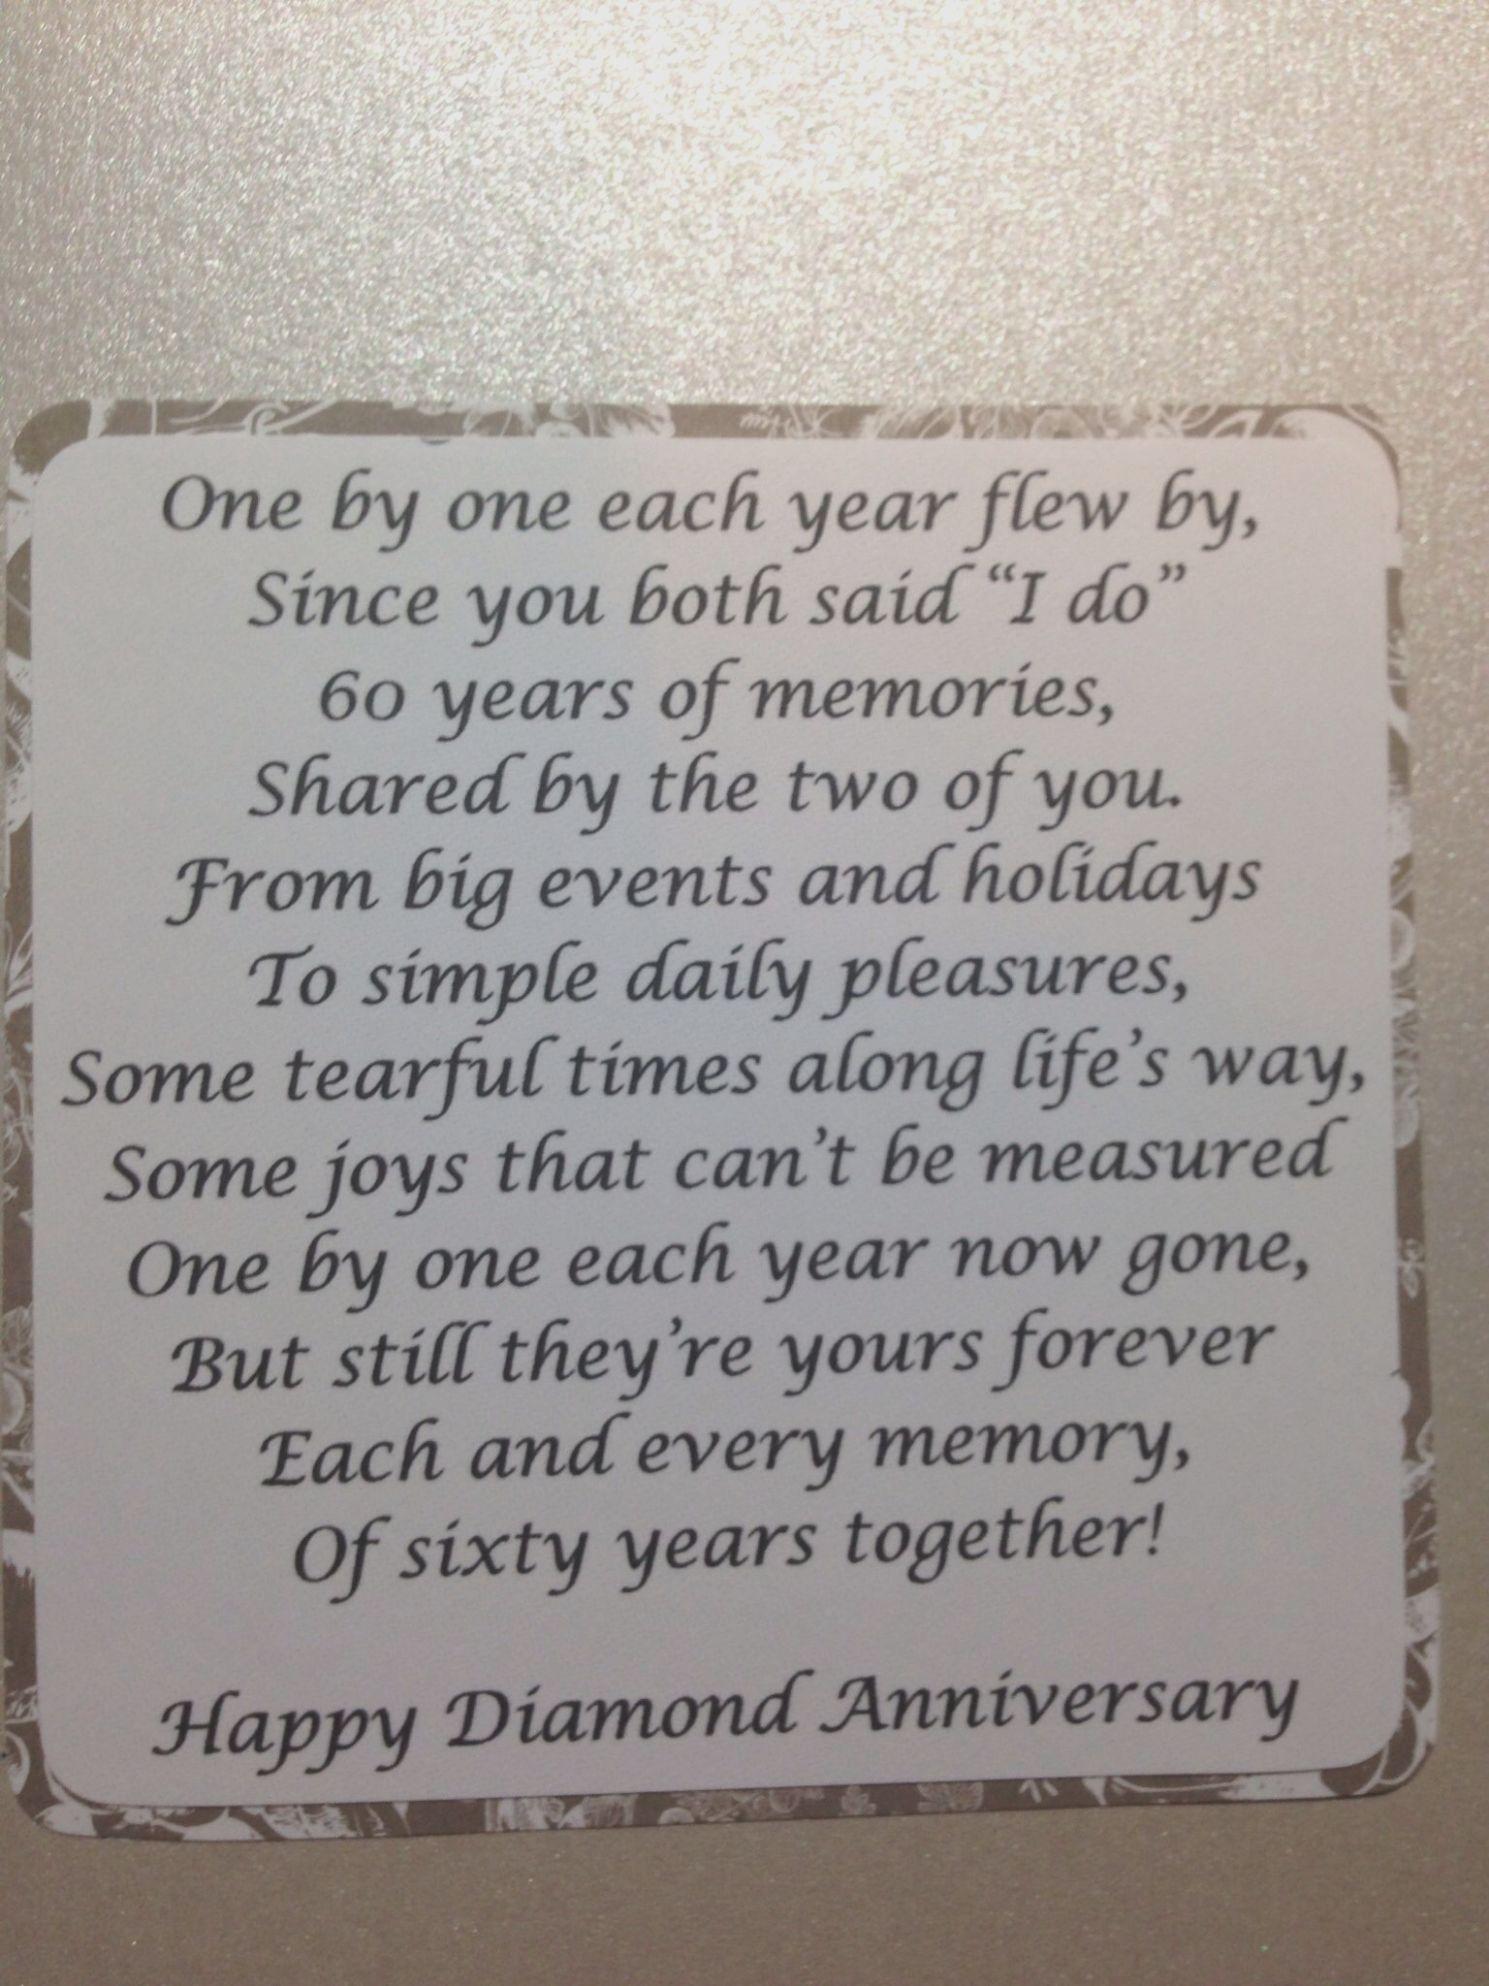 10 Card Verses For 60th Wedding Anniversary Wedding Anniversary Quotes Wedding Anniversary Poems 50th Wedding Anniversary Party